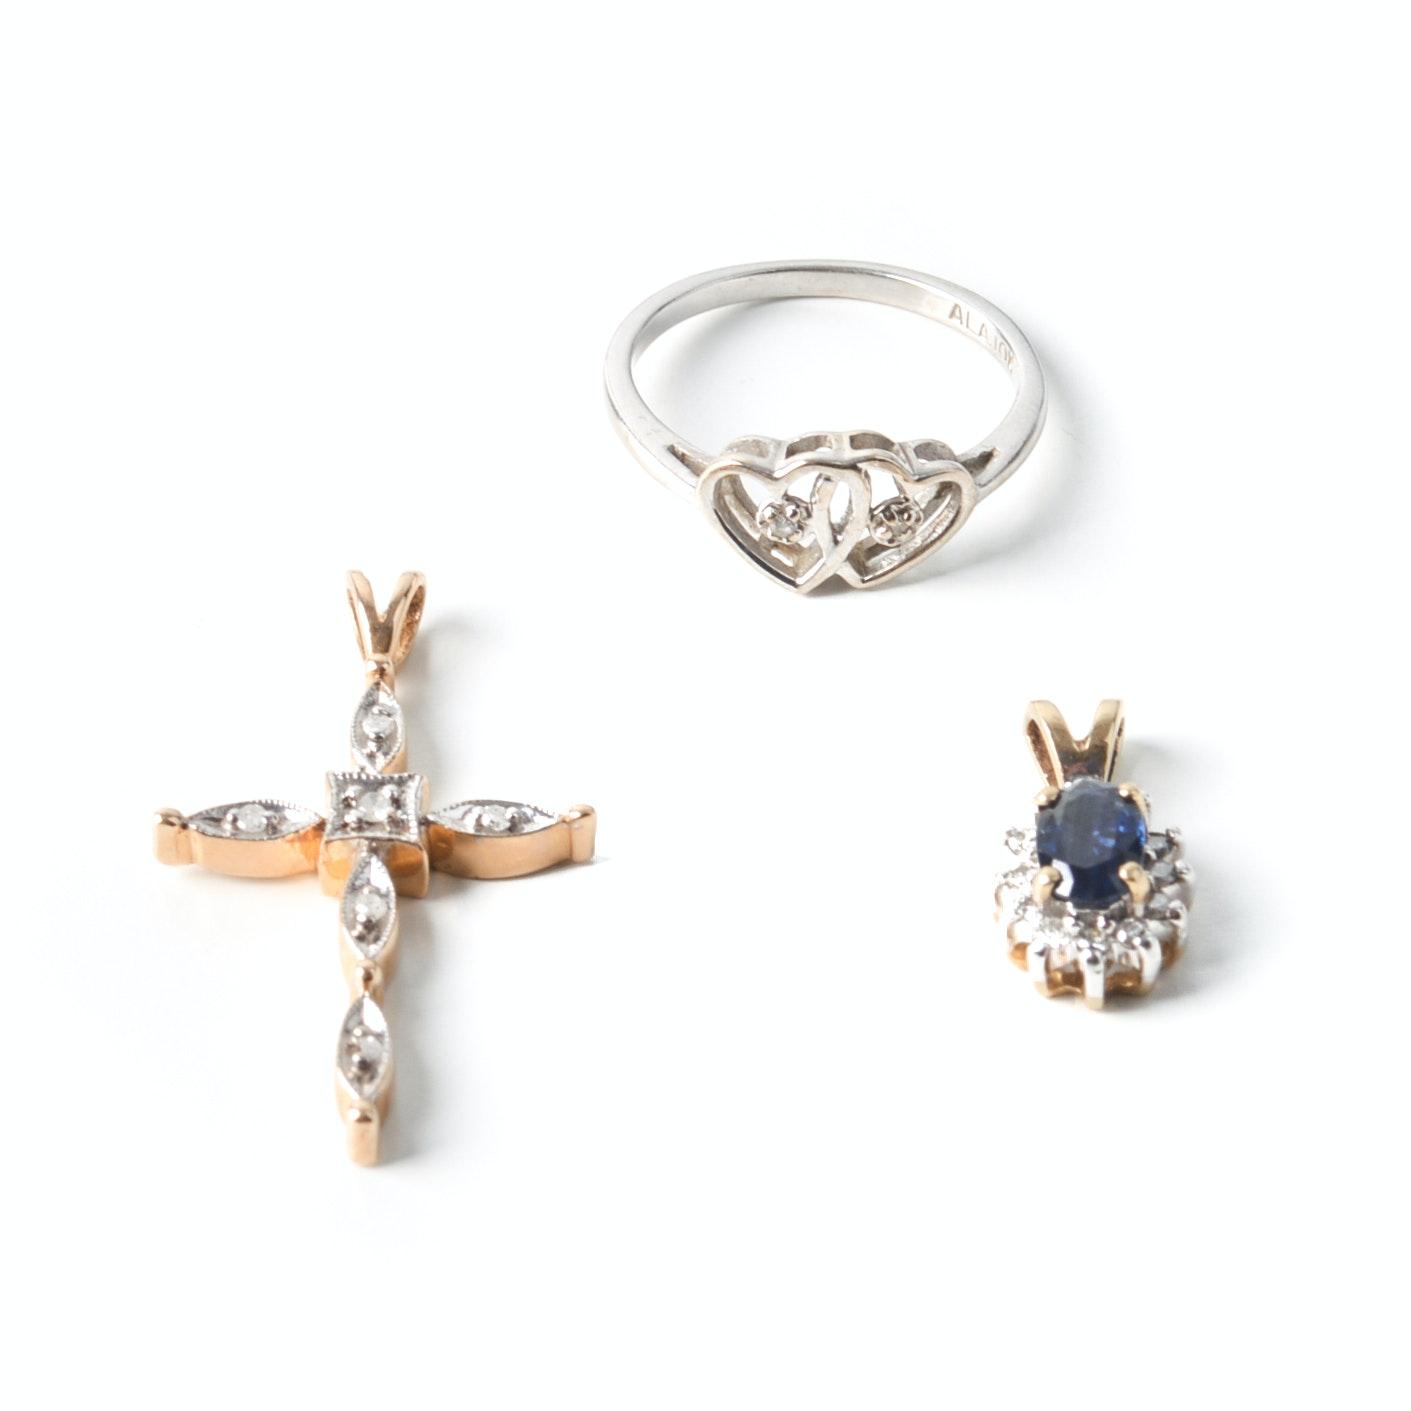 10K Gold Diamond Pendants and Ring